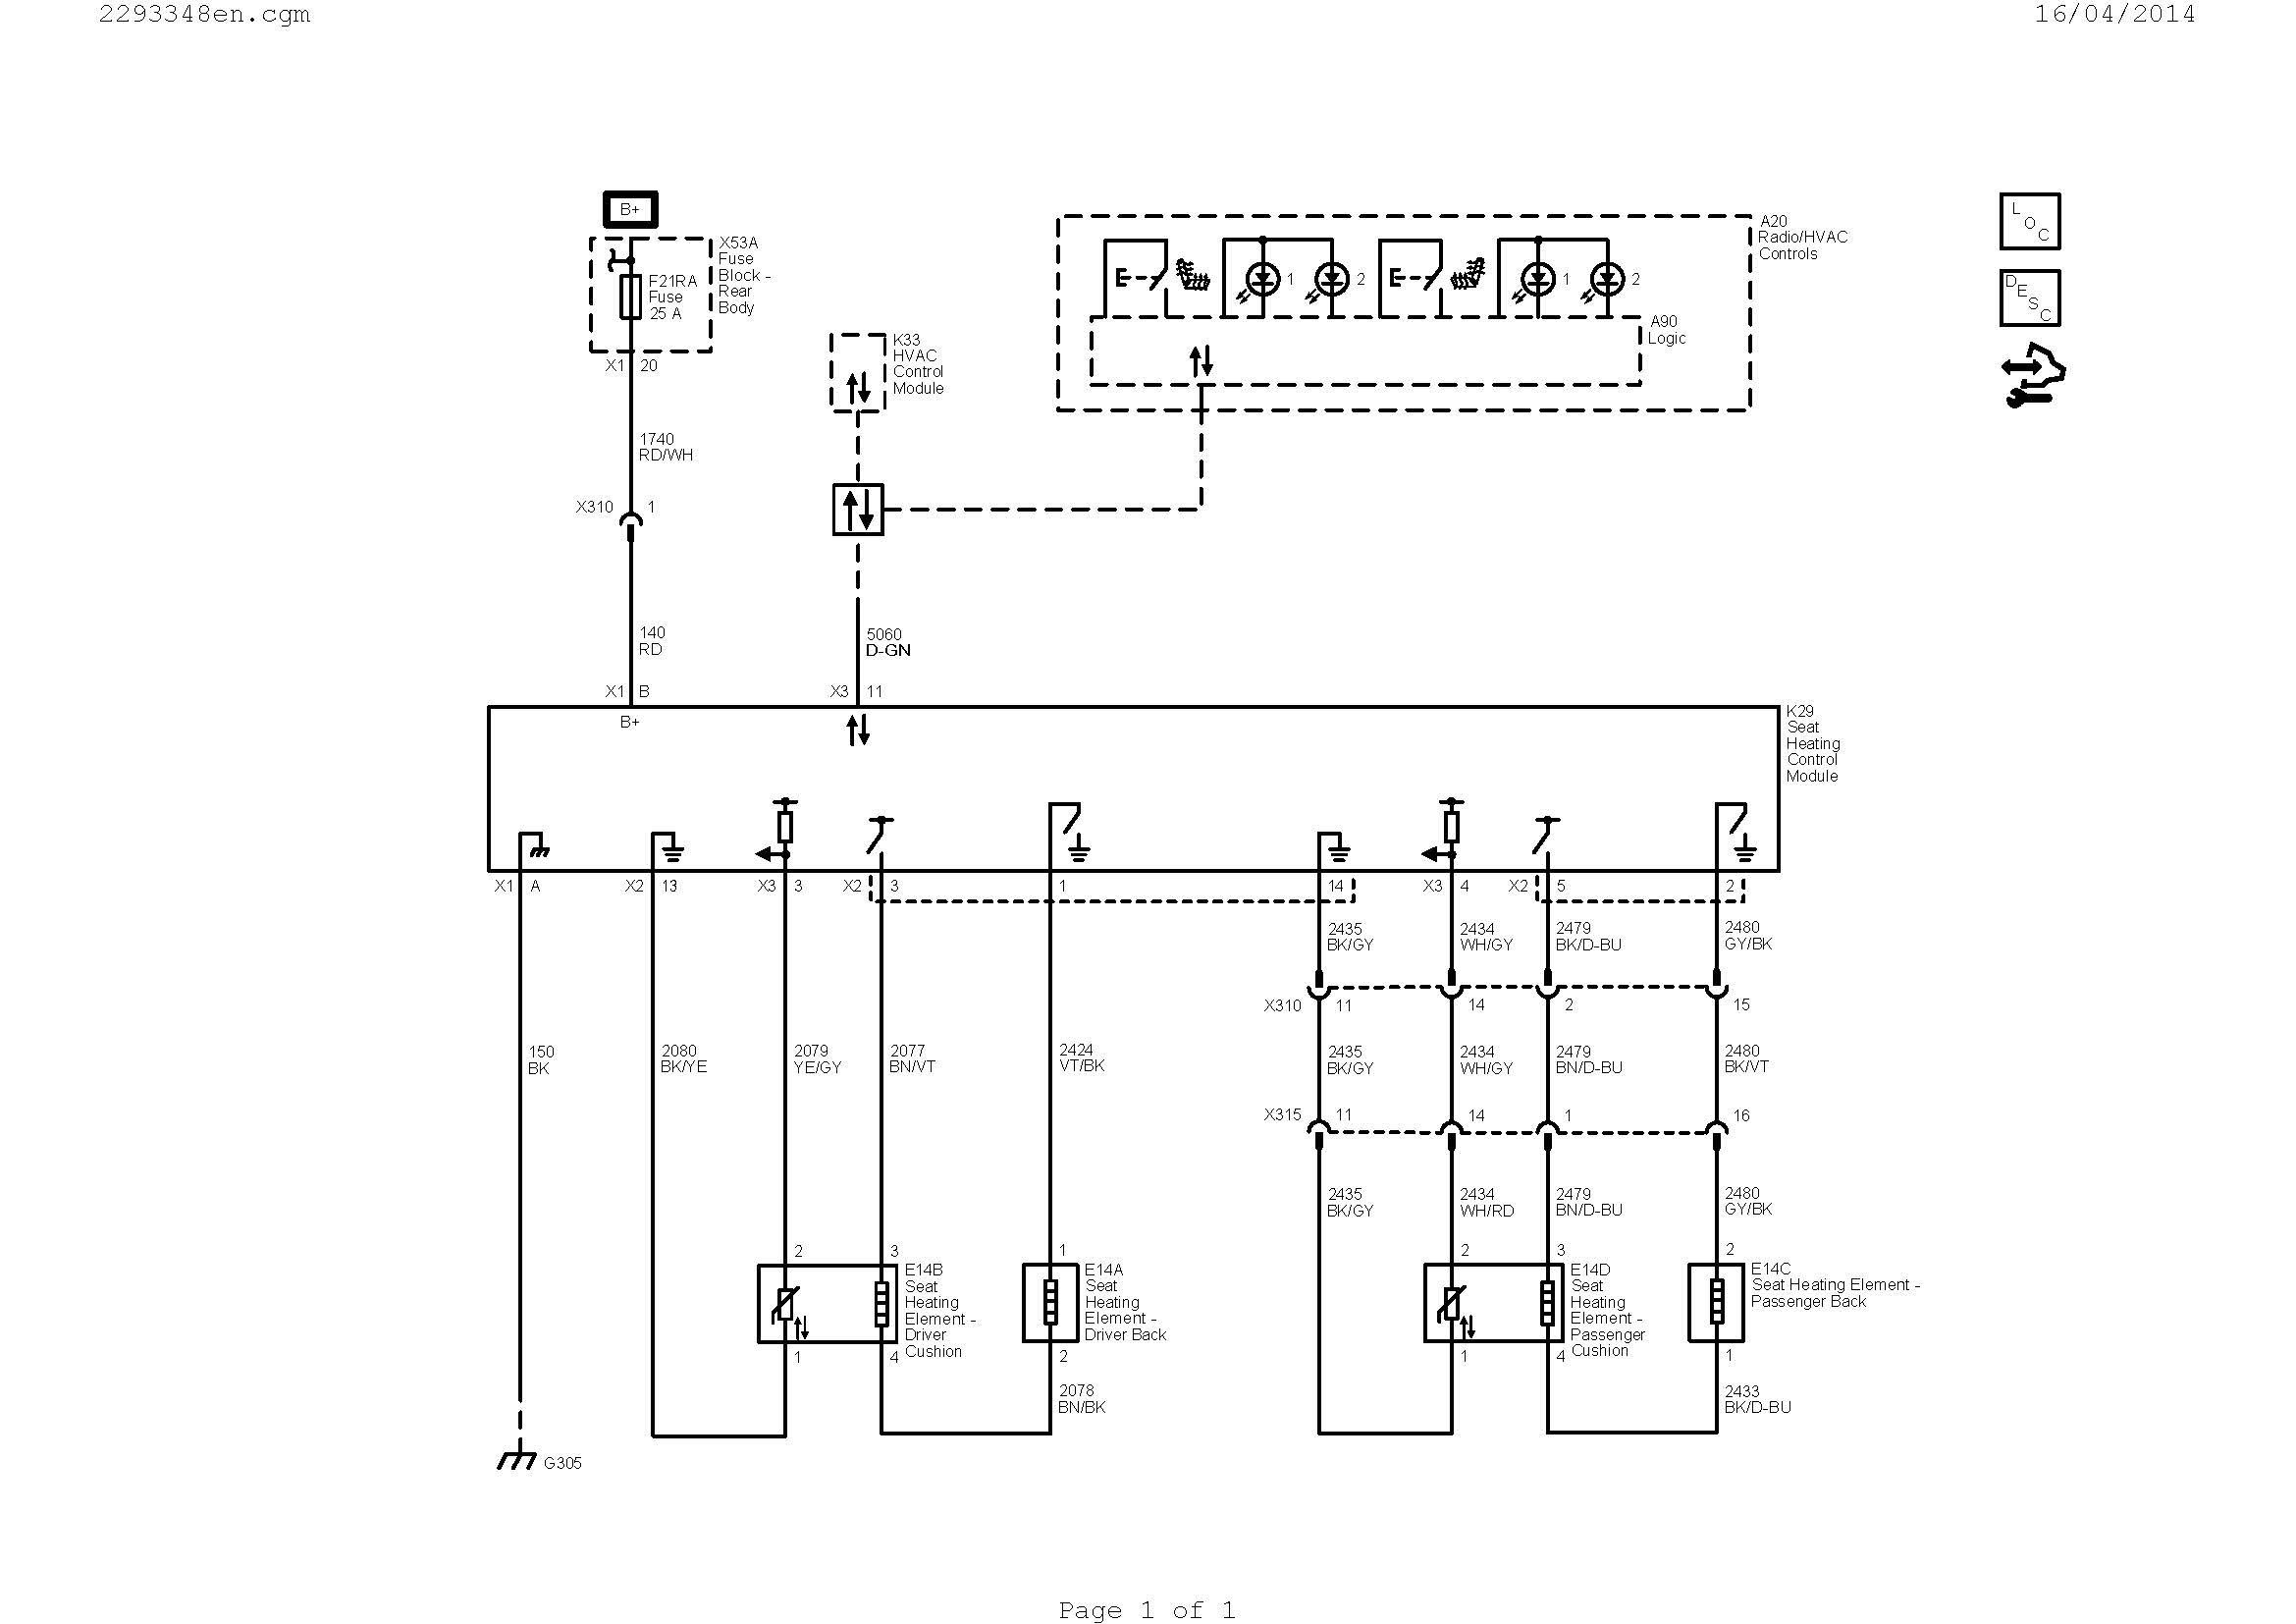 Trailer Brake Wiring Wiring Diagram Trailer Electric Brakes Fresh Trailer Wire Diagram New Hvac Diagram DOWNLOAD Wiring Diagram Details